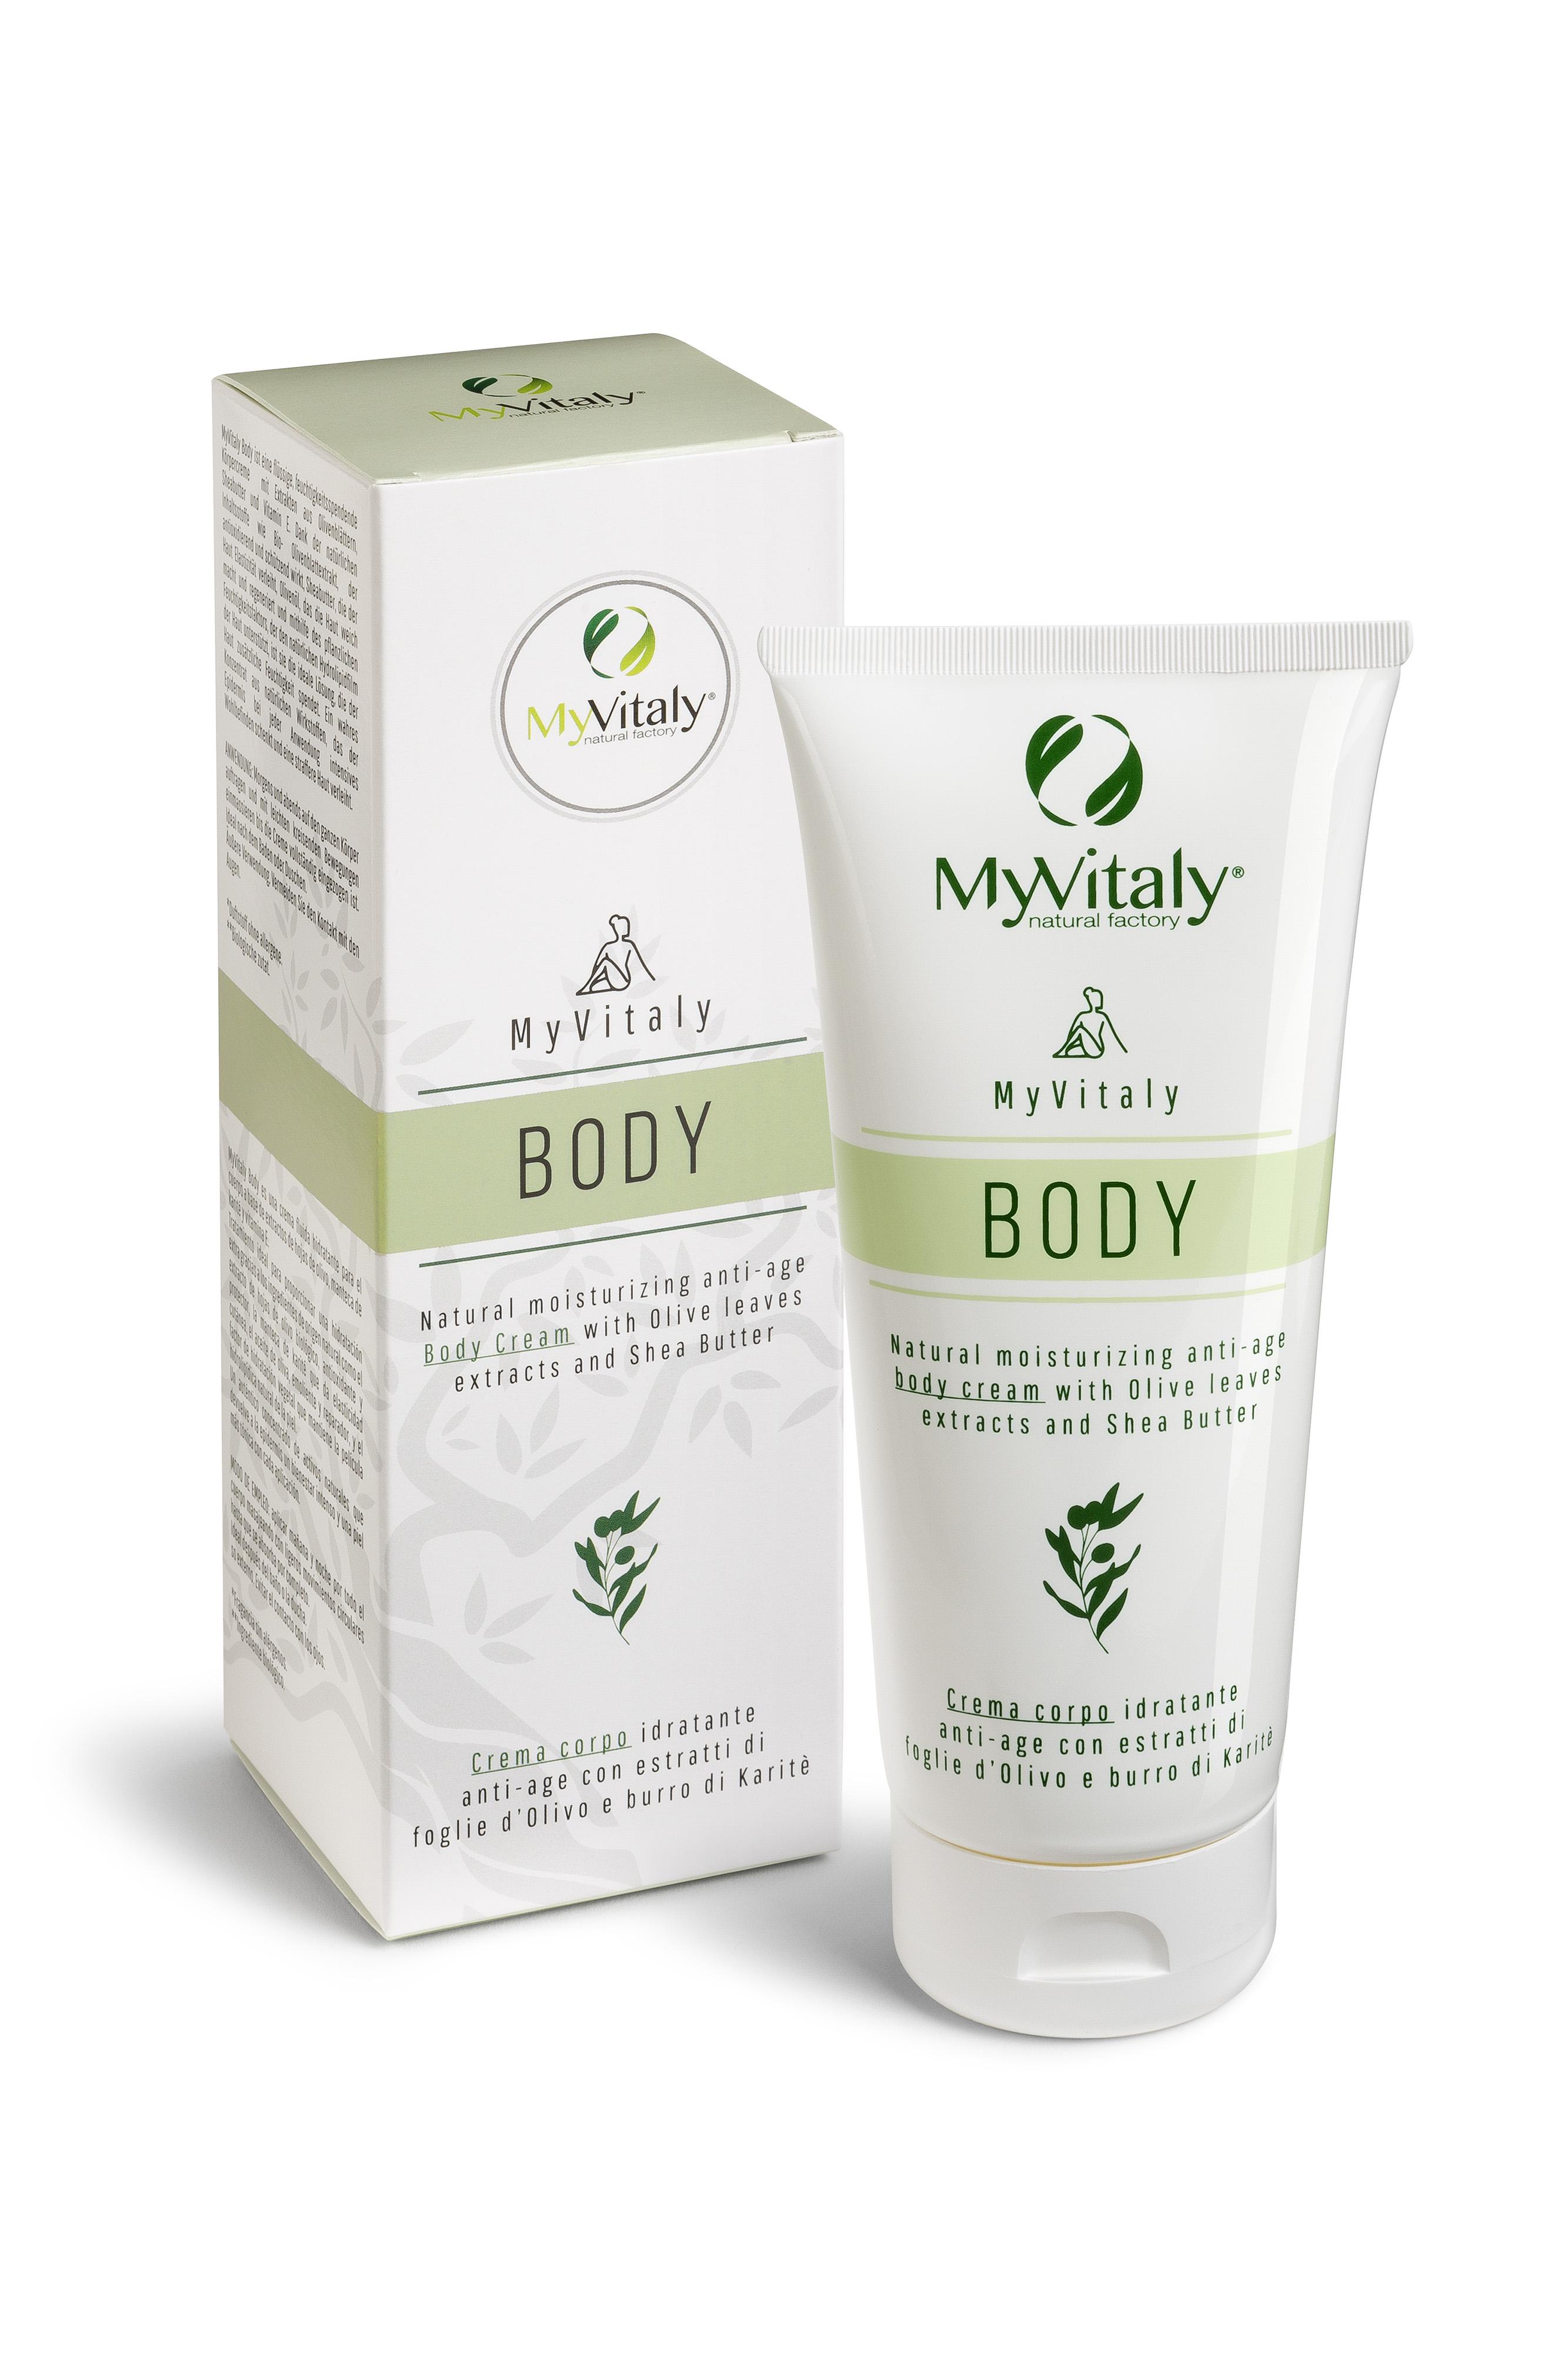 MyVitaly Body crema corpo all'olivo